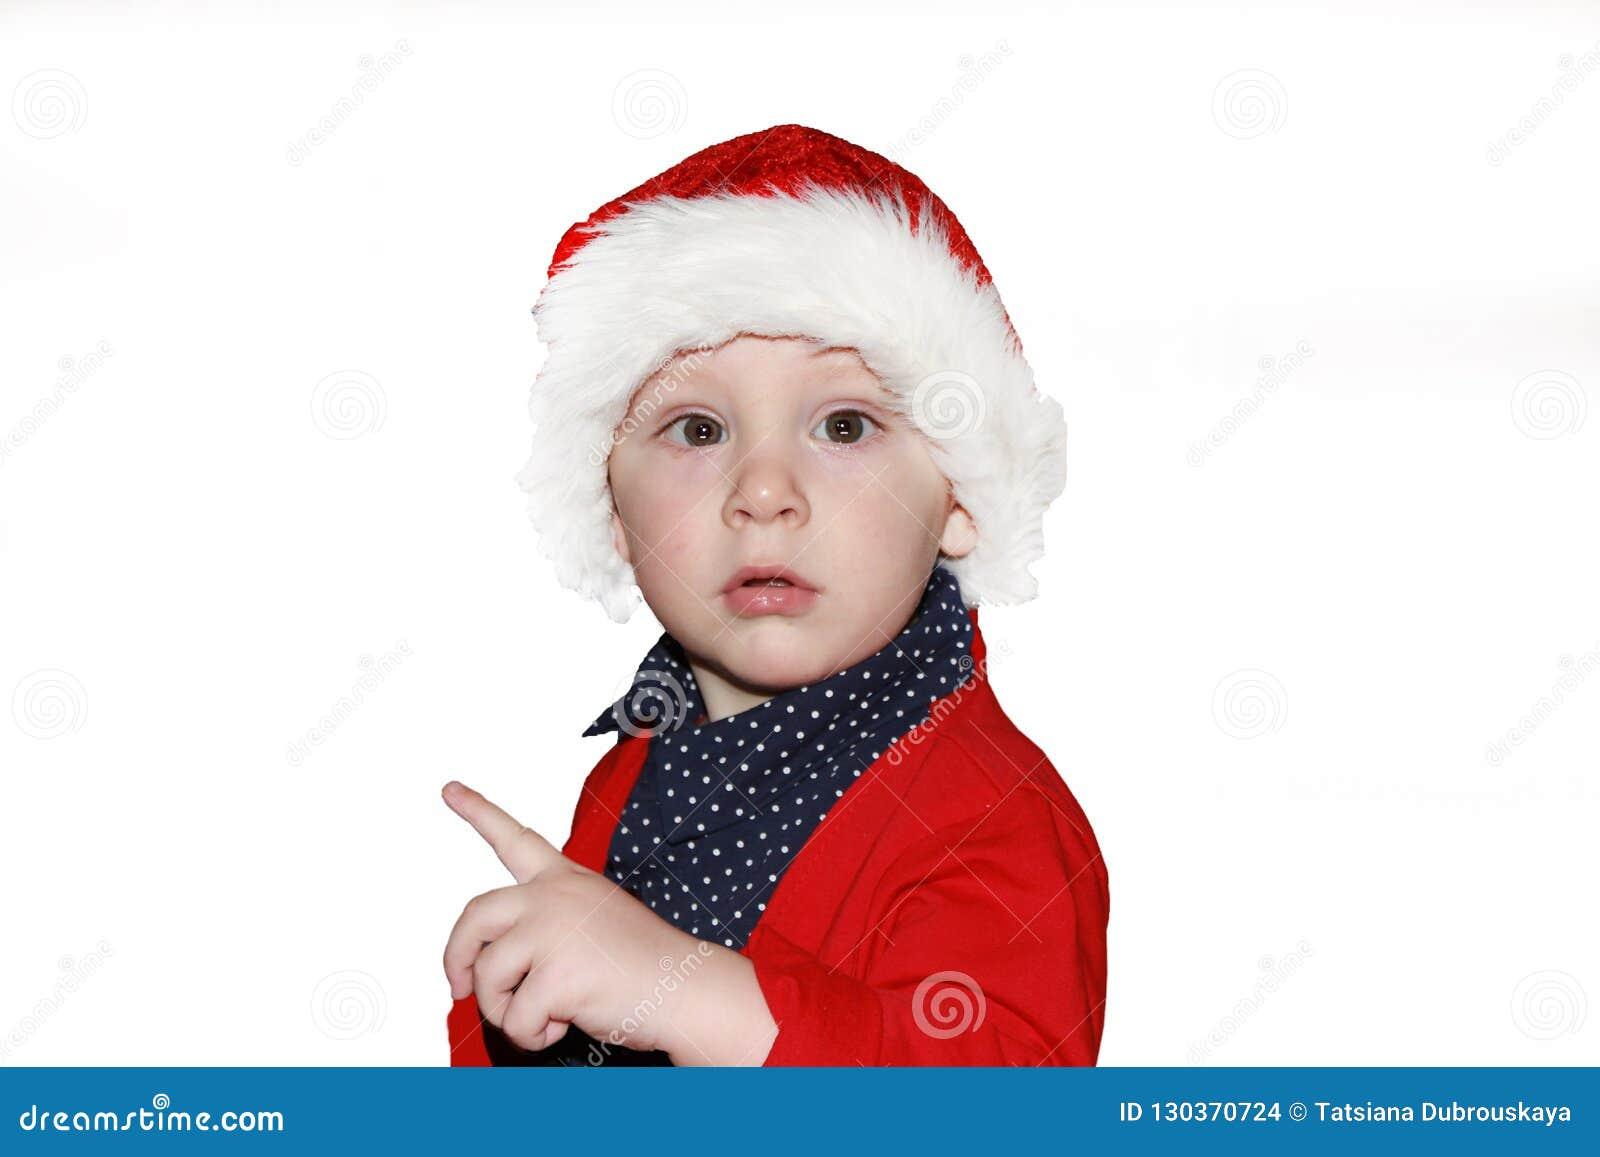 c8af0822e Closeup Portrait Of A Cute Little Baby Boy Wearing Red Santa Claus ...